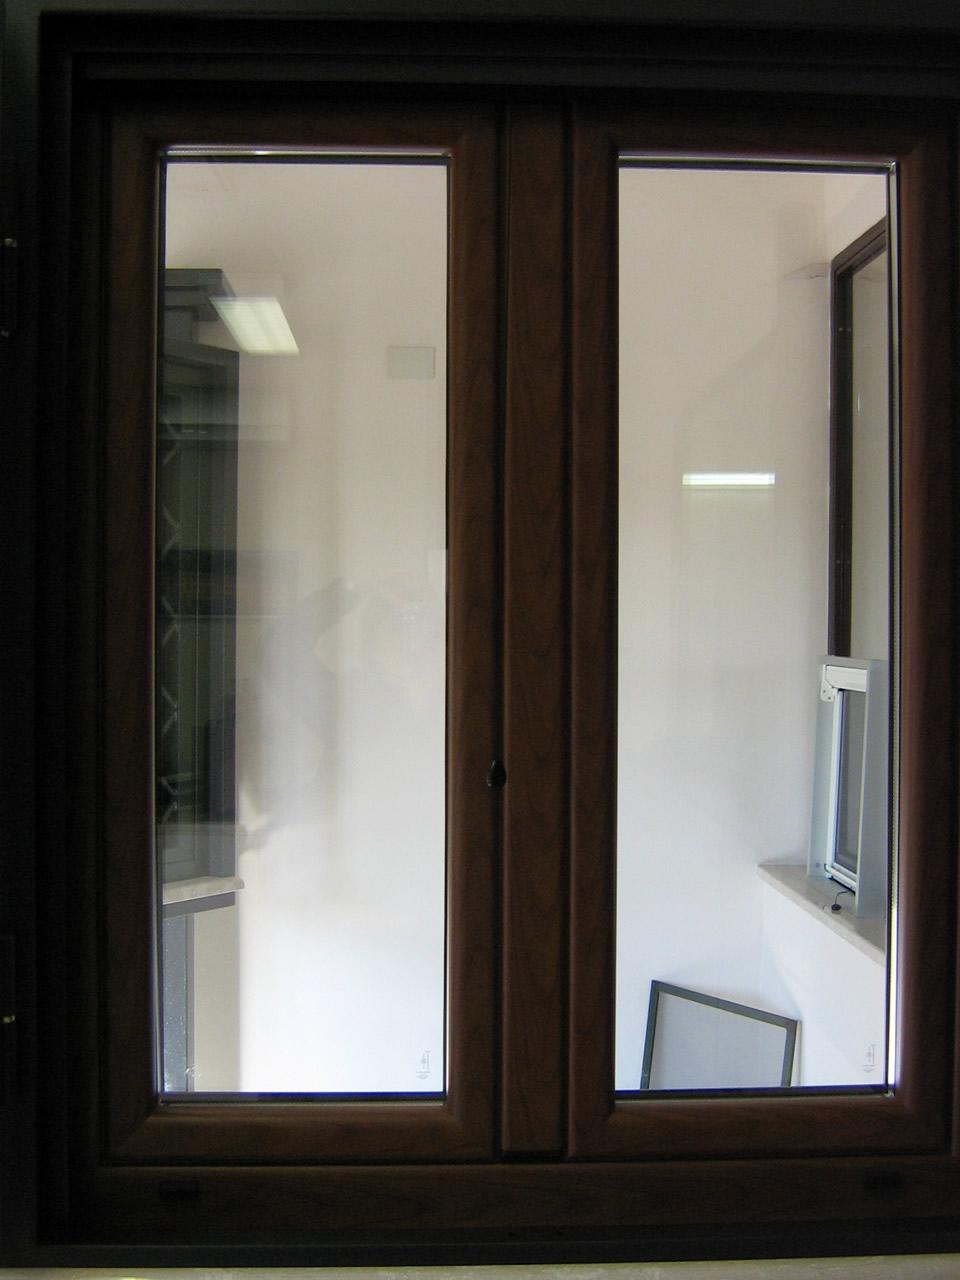 Infissi e serramenti roma fl serramenti - Infissi finestre roma ...